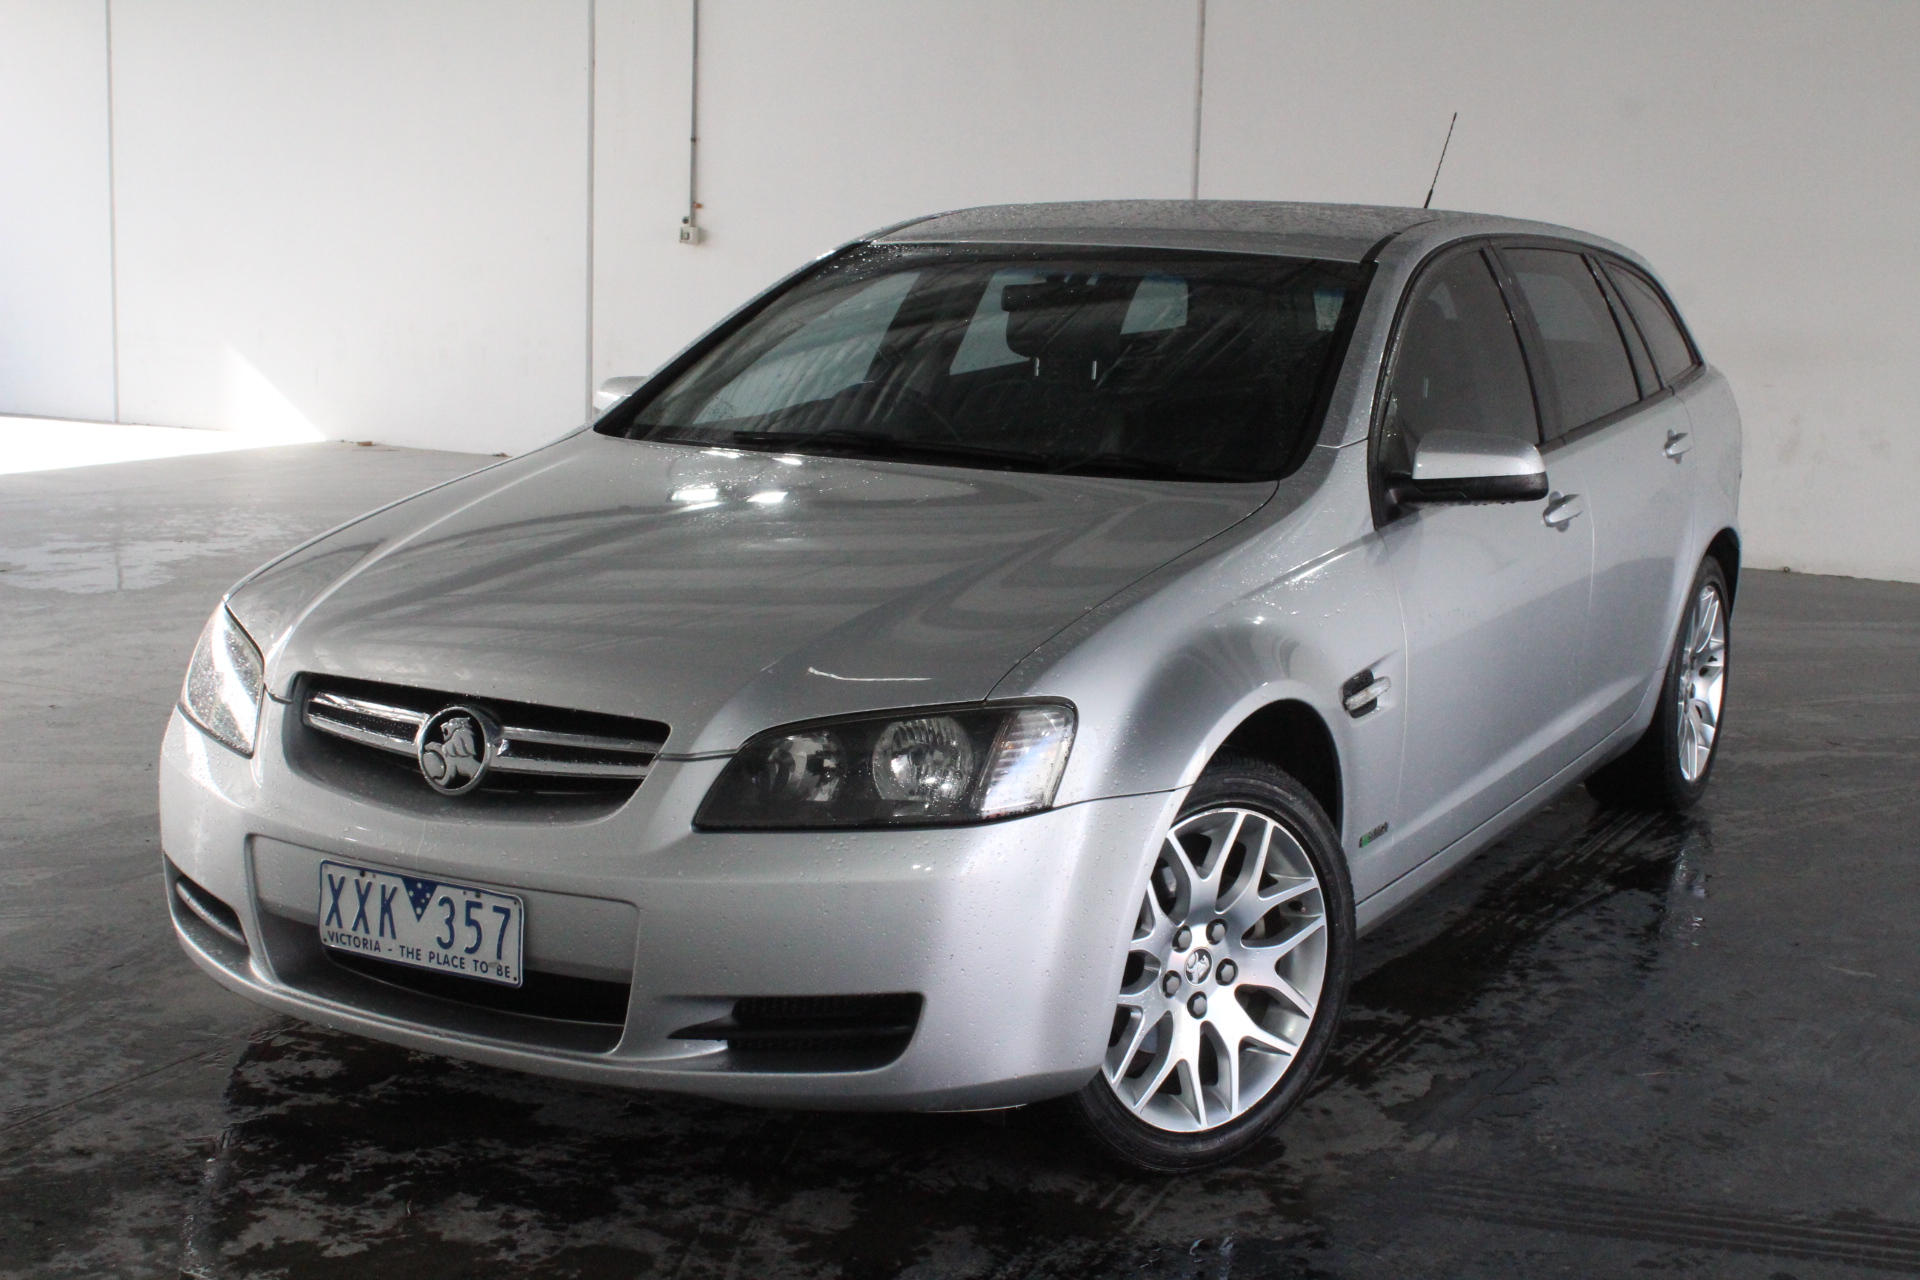 2010 Holden Sportwagon Omega VE Automatic Wagon